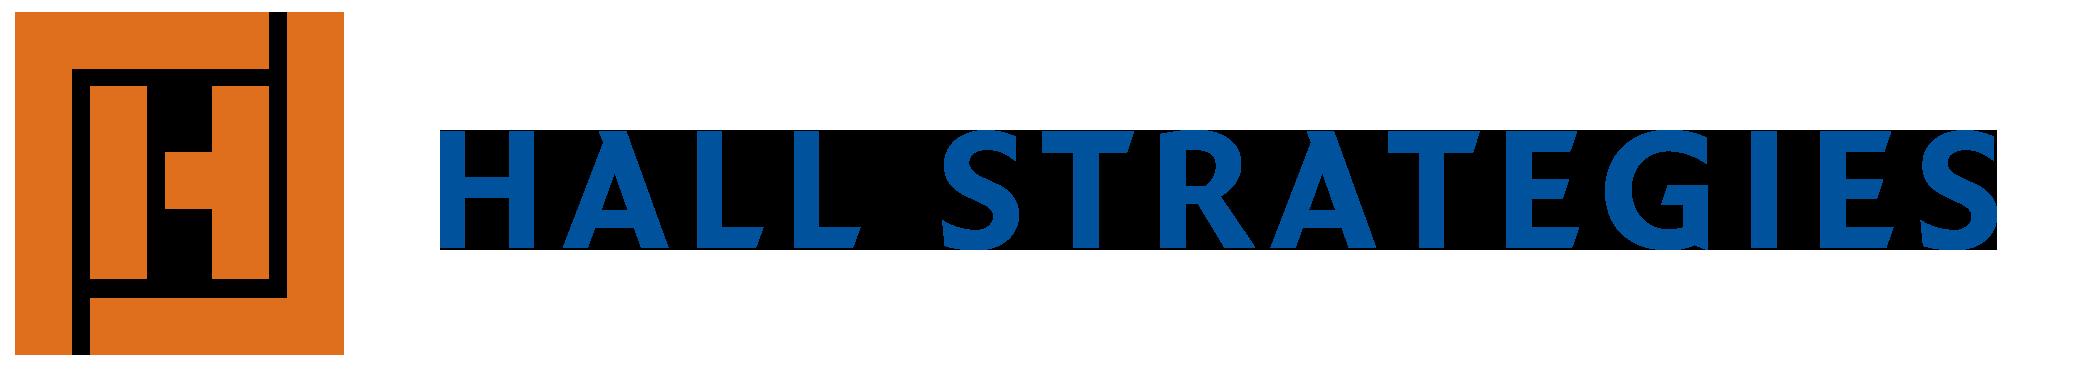 hallstrategies Logo